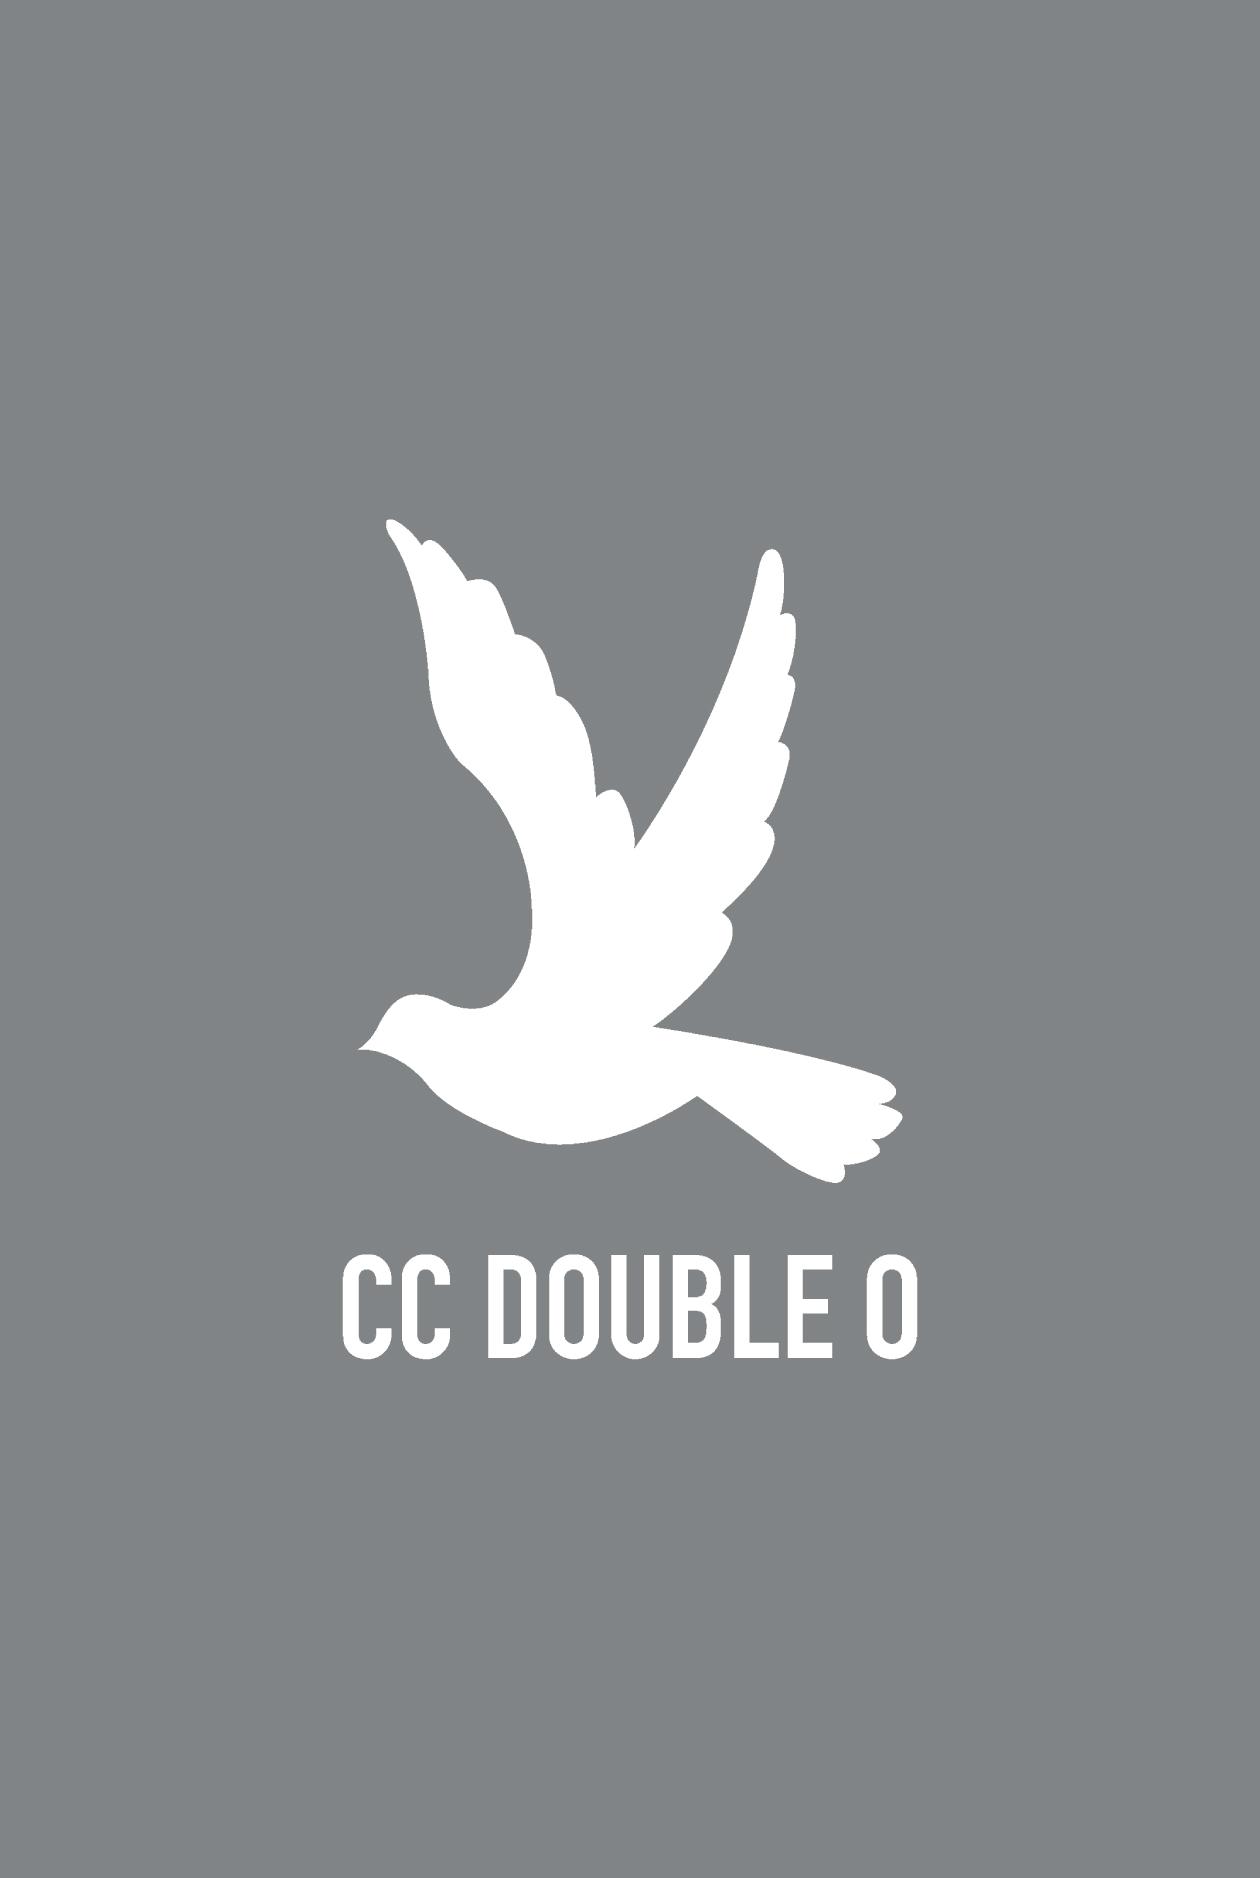 BIRD LOGO POLO WITH SIDE STRIPED DETAIL